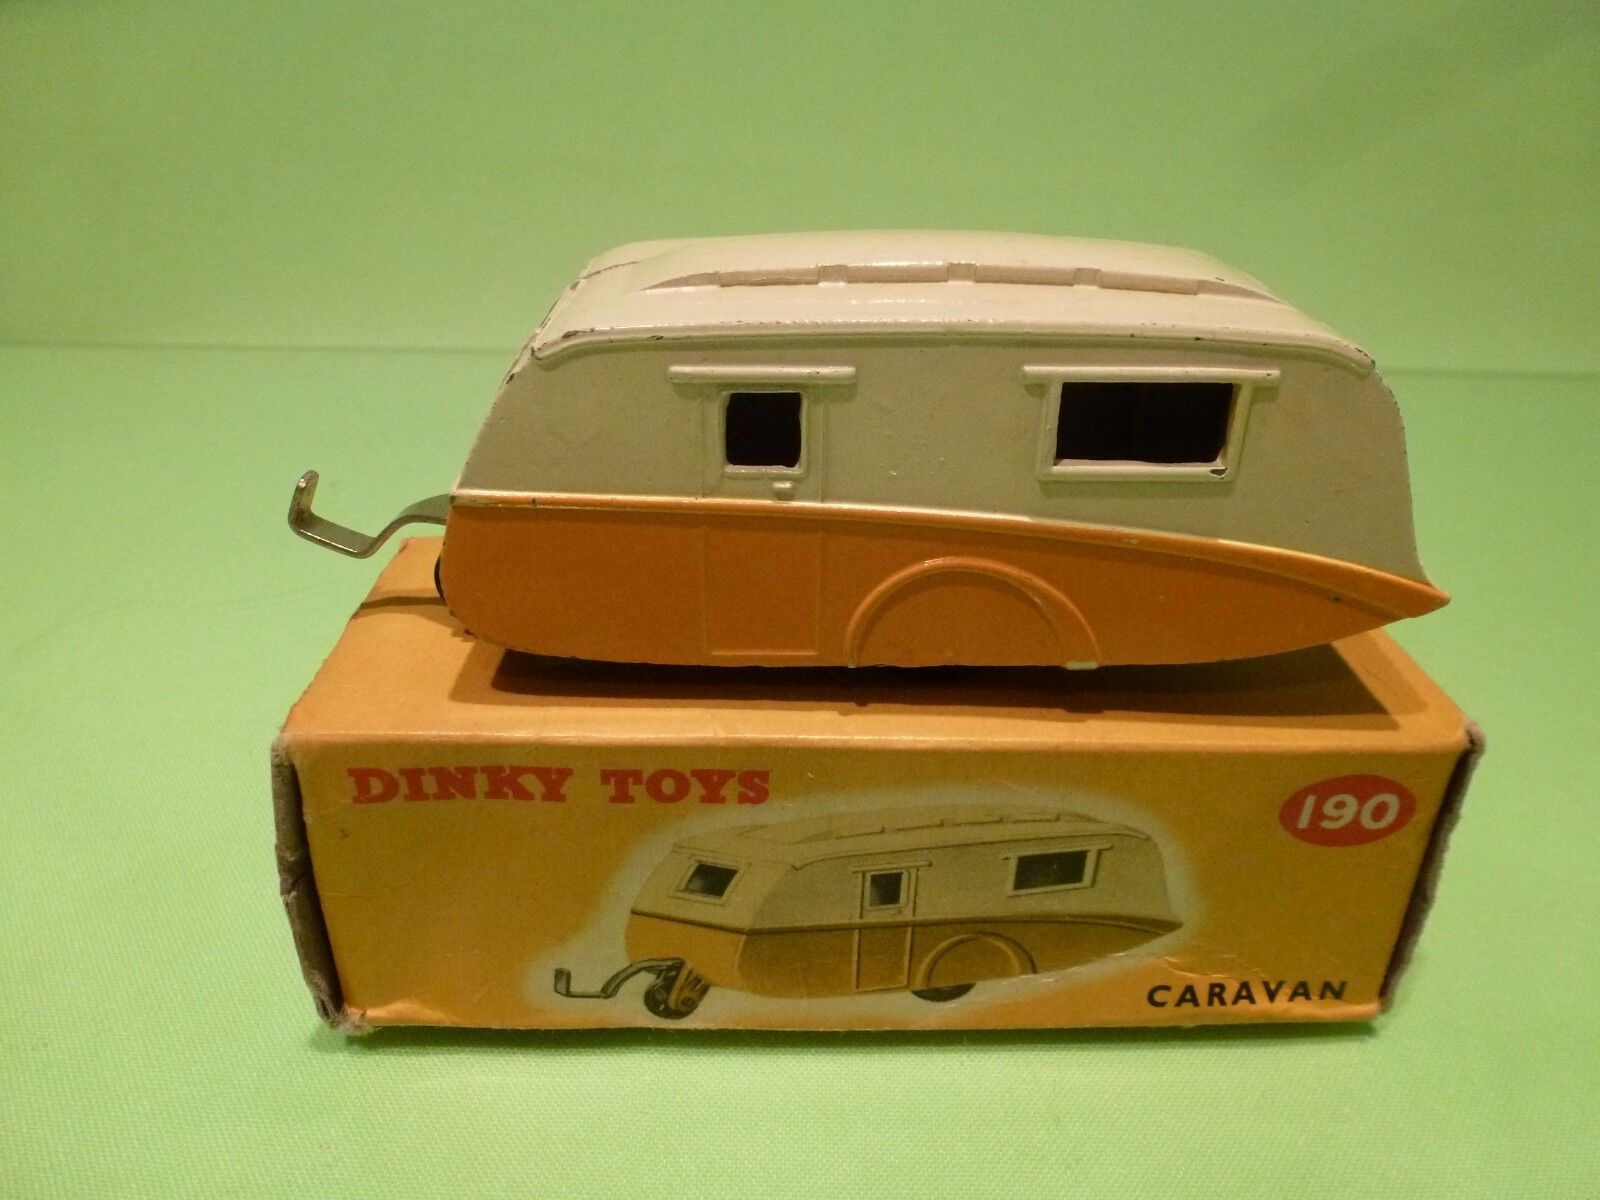 DINKY TOYS 190 CARAVAN WOHNWAGEN - jaune Orange + CREAM - EXCELLENT IN BOX